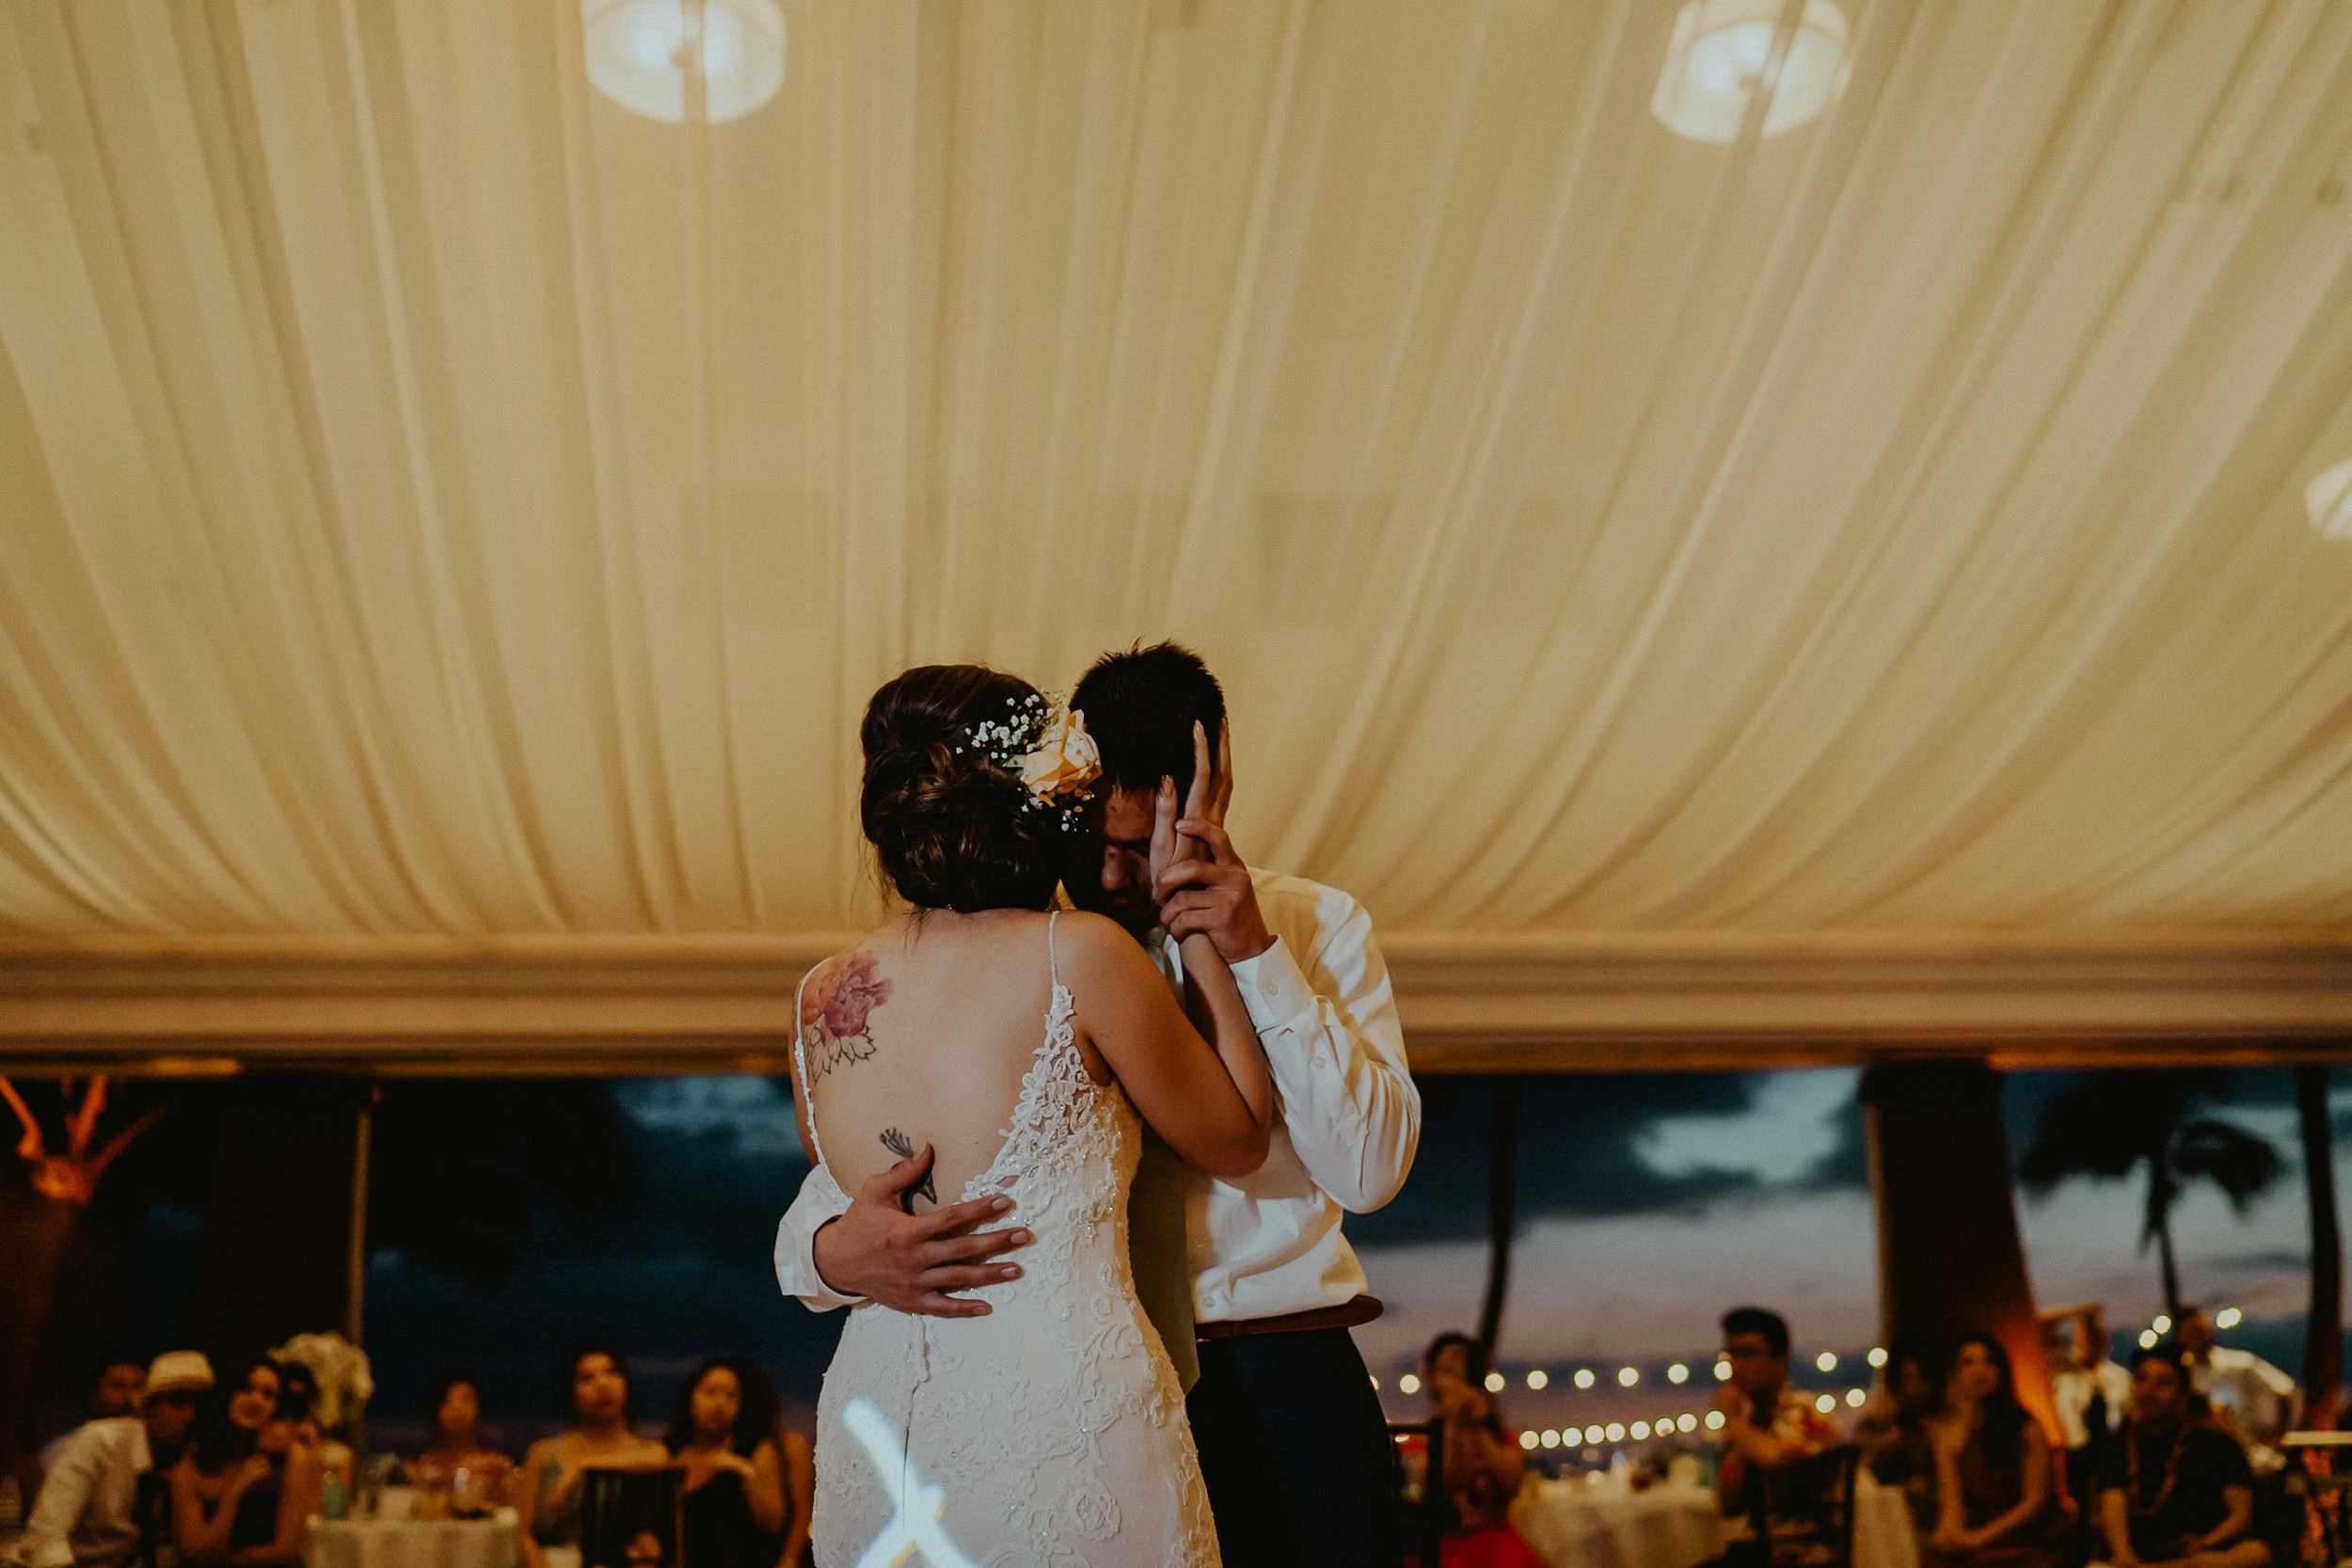 Maui_Destination_wedding_Alfred_Tang-82.jpg